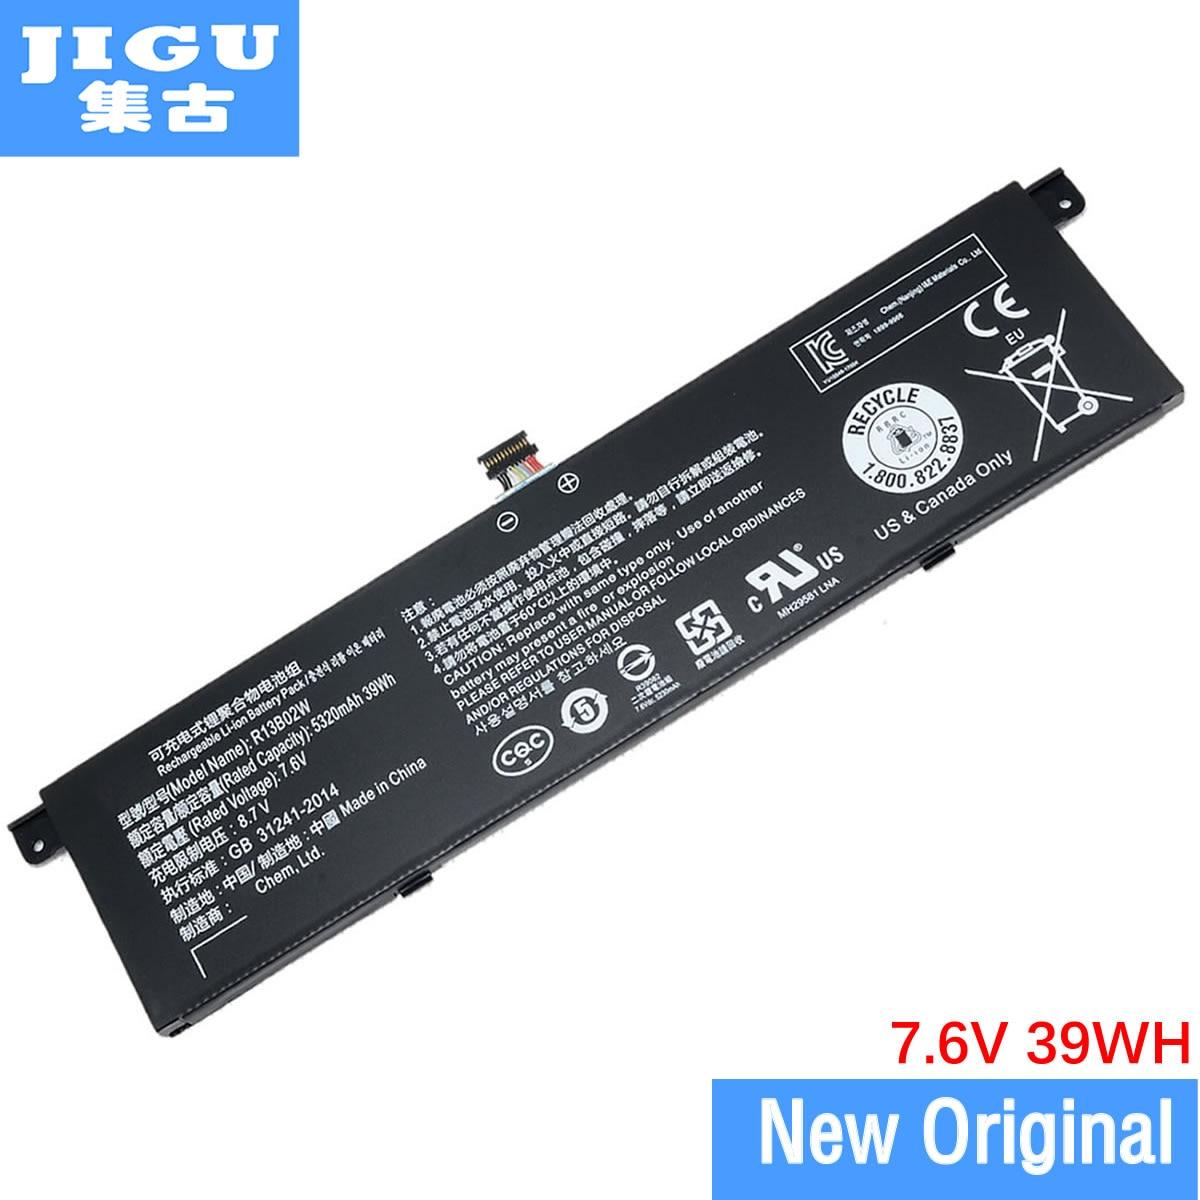 JIGU Original 7.6V New R13B01W R13B02W Laptop Battery For Xiaomi Mi Air 13.3